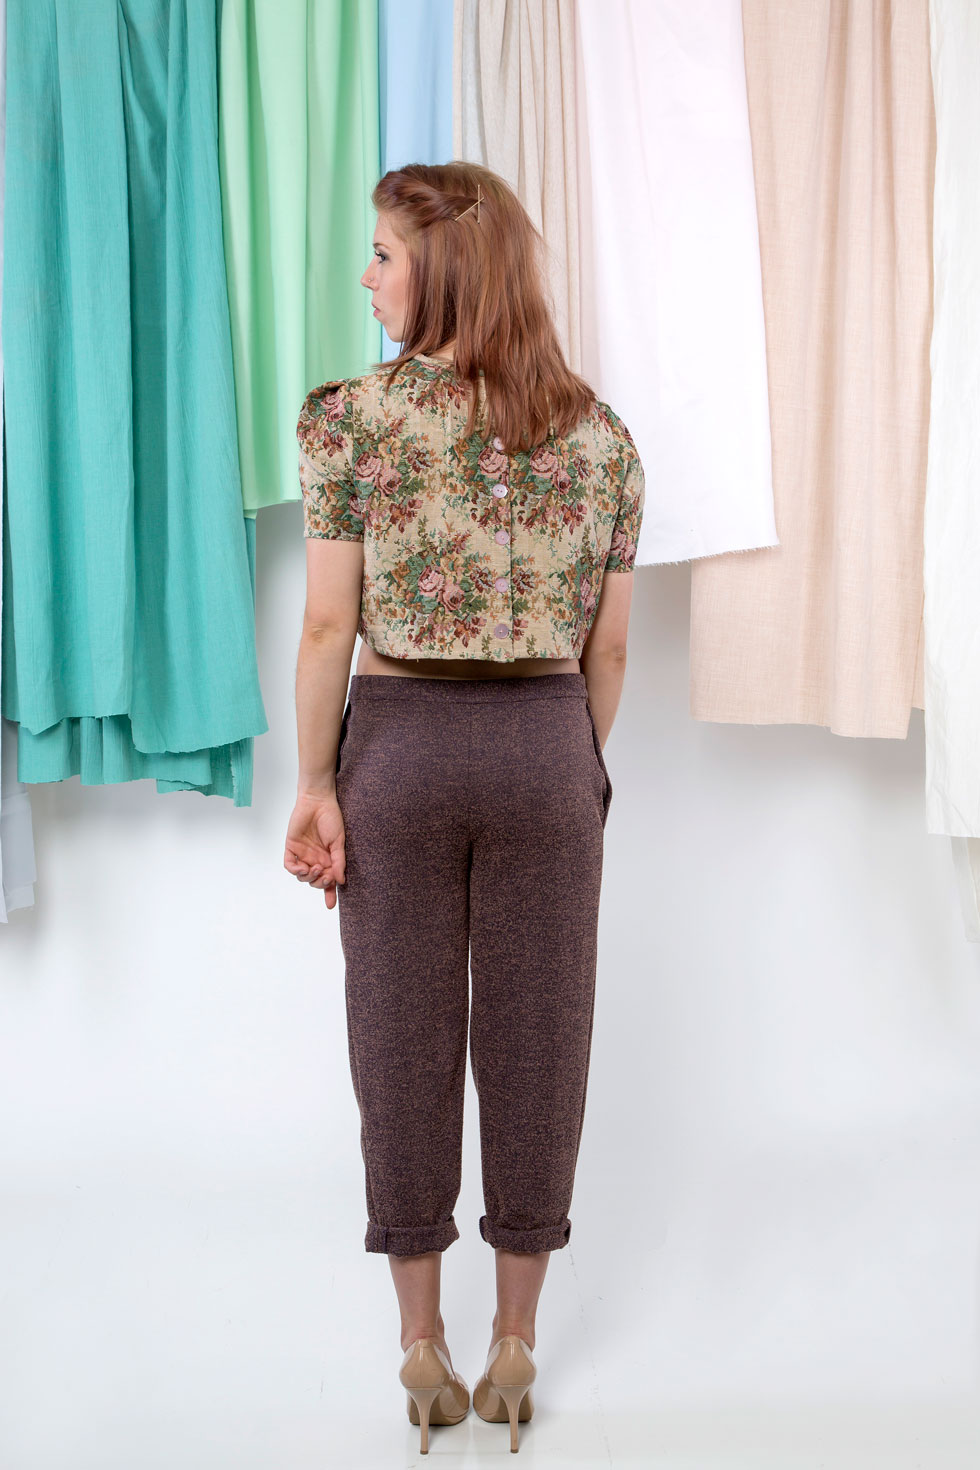 Cora Top & Violet Pants